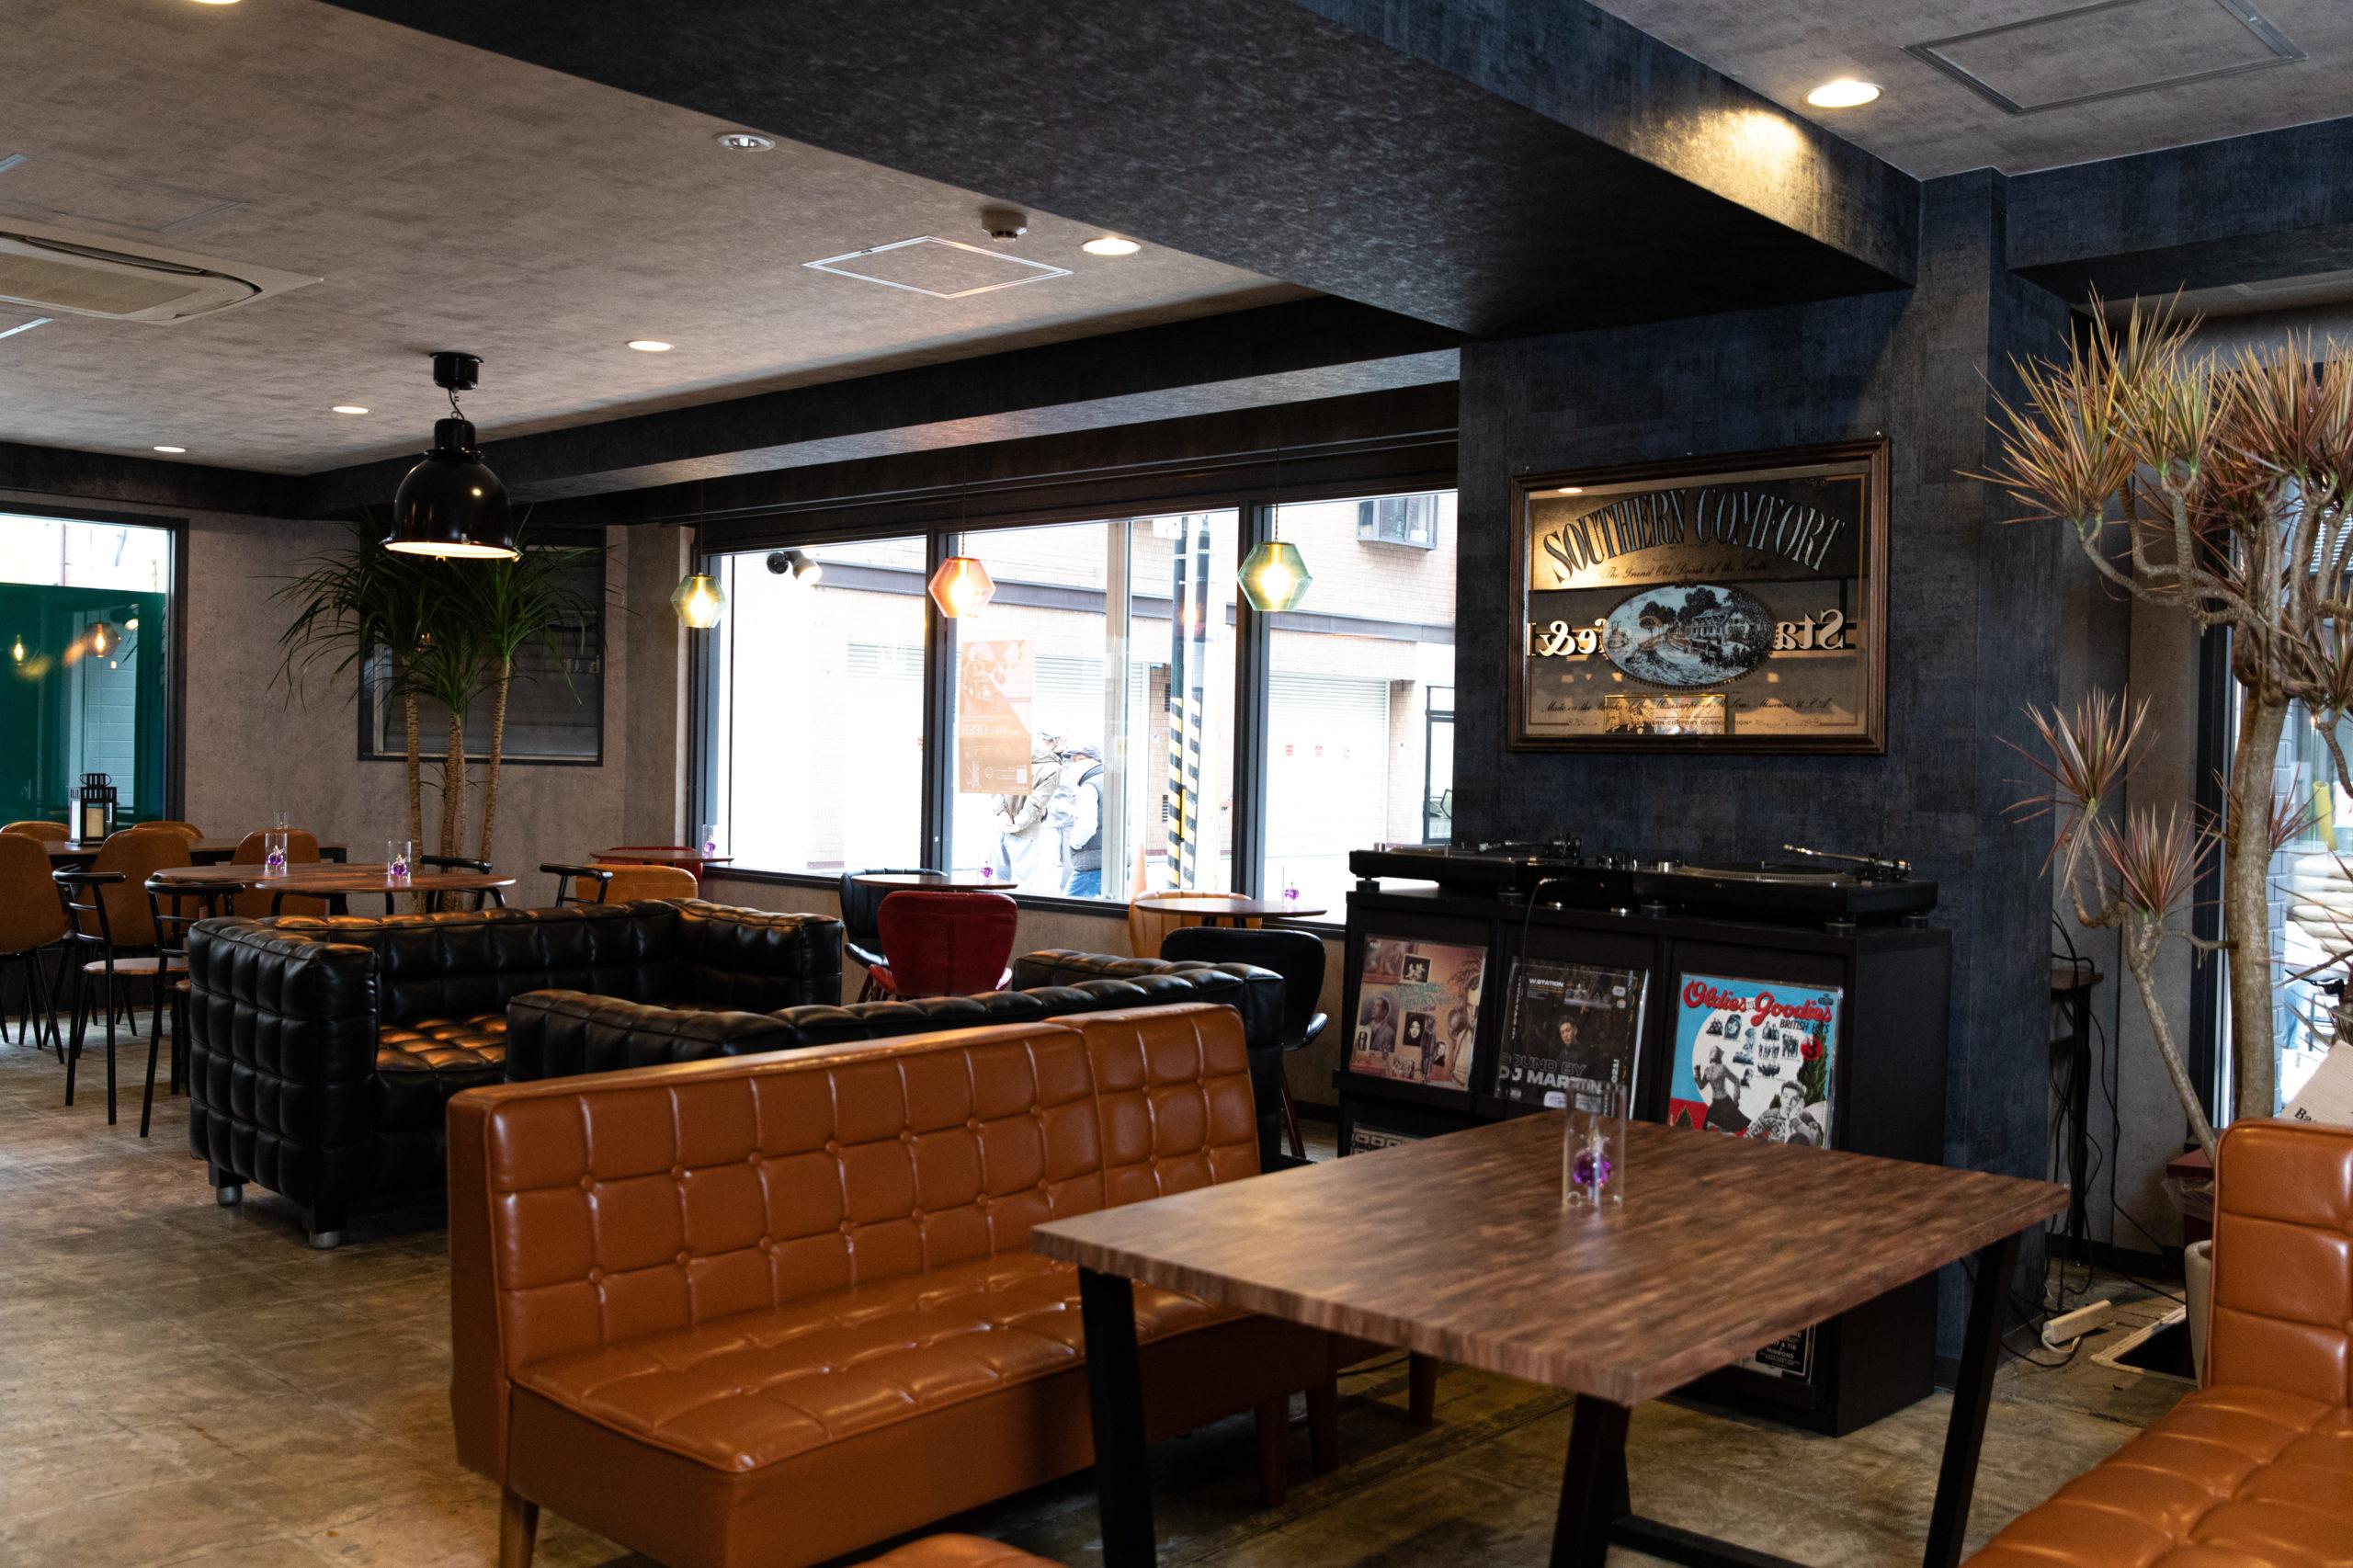 W Station café bar